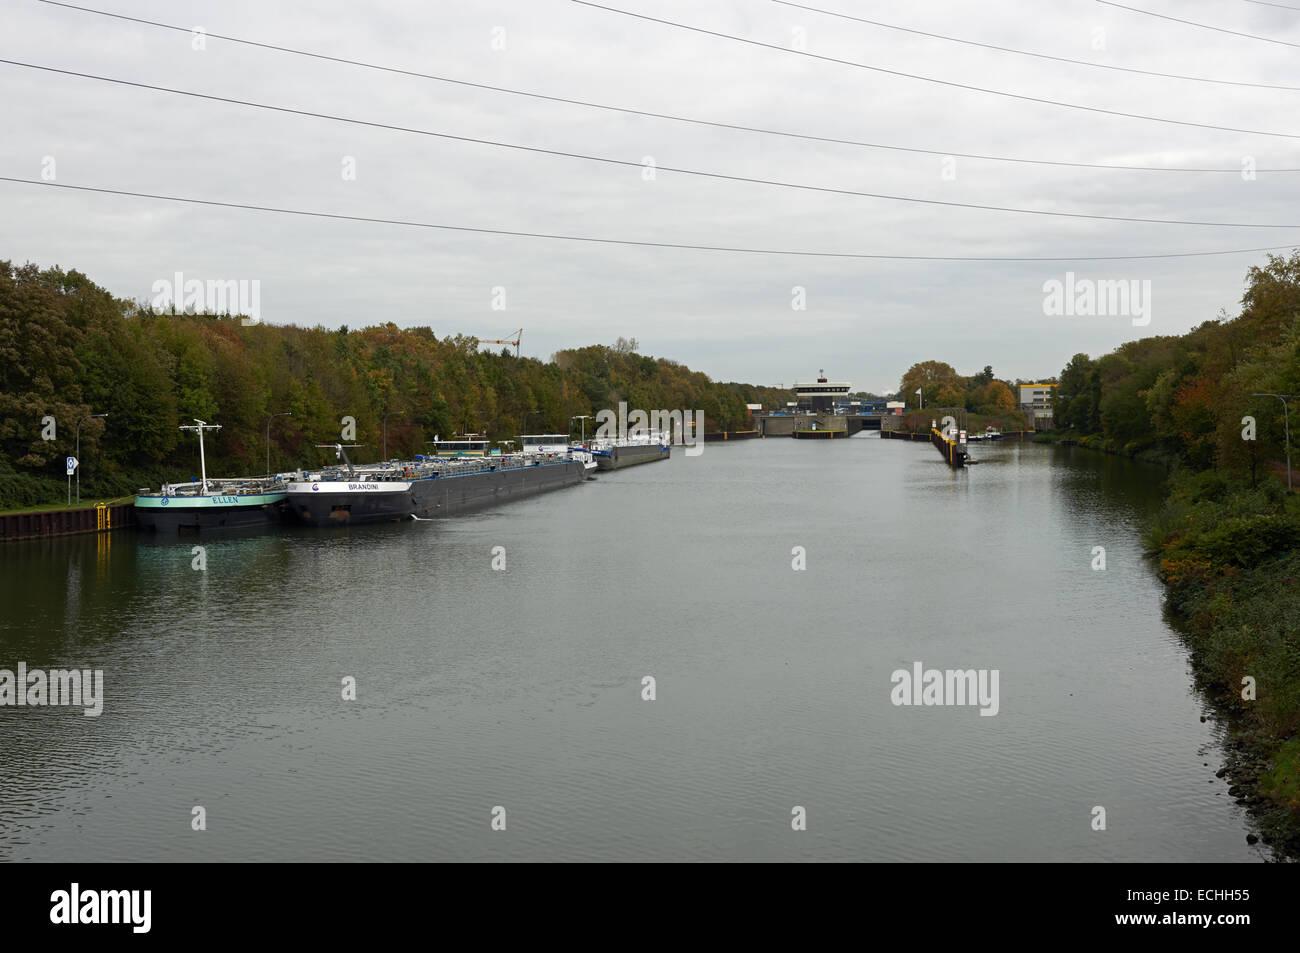 Oil tankers Gelsenkirchen-Horst North Rhine-Westphalia, Germany - Stock Image